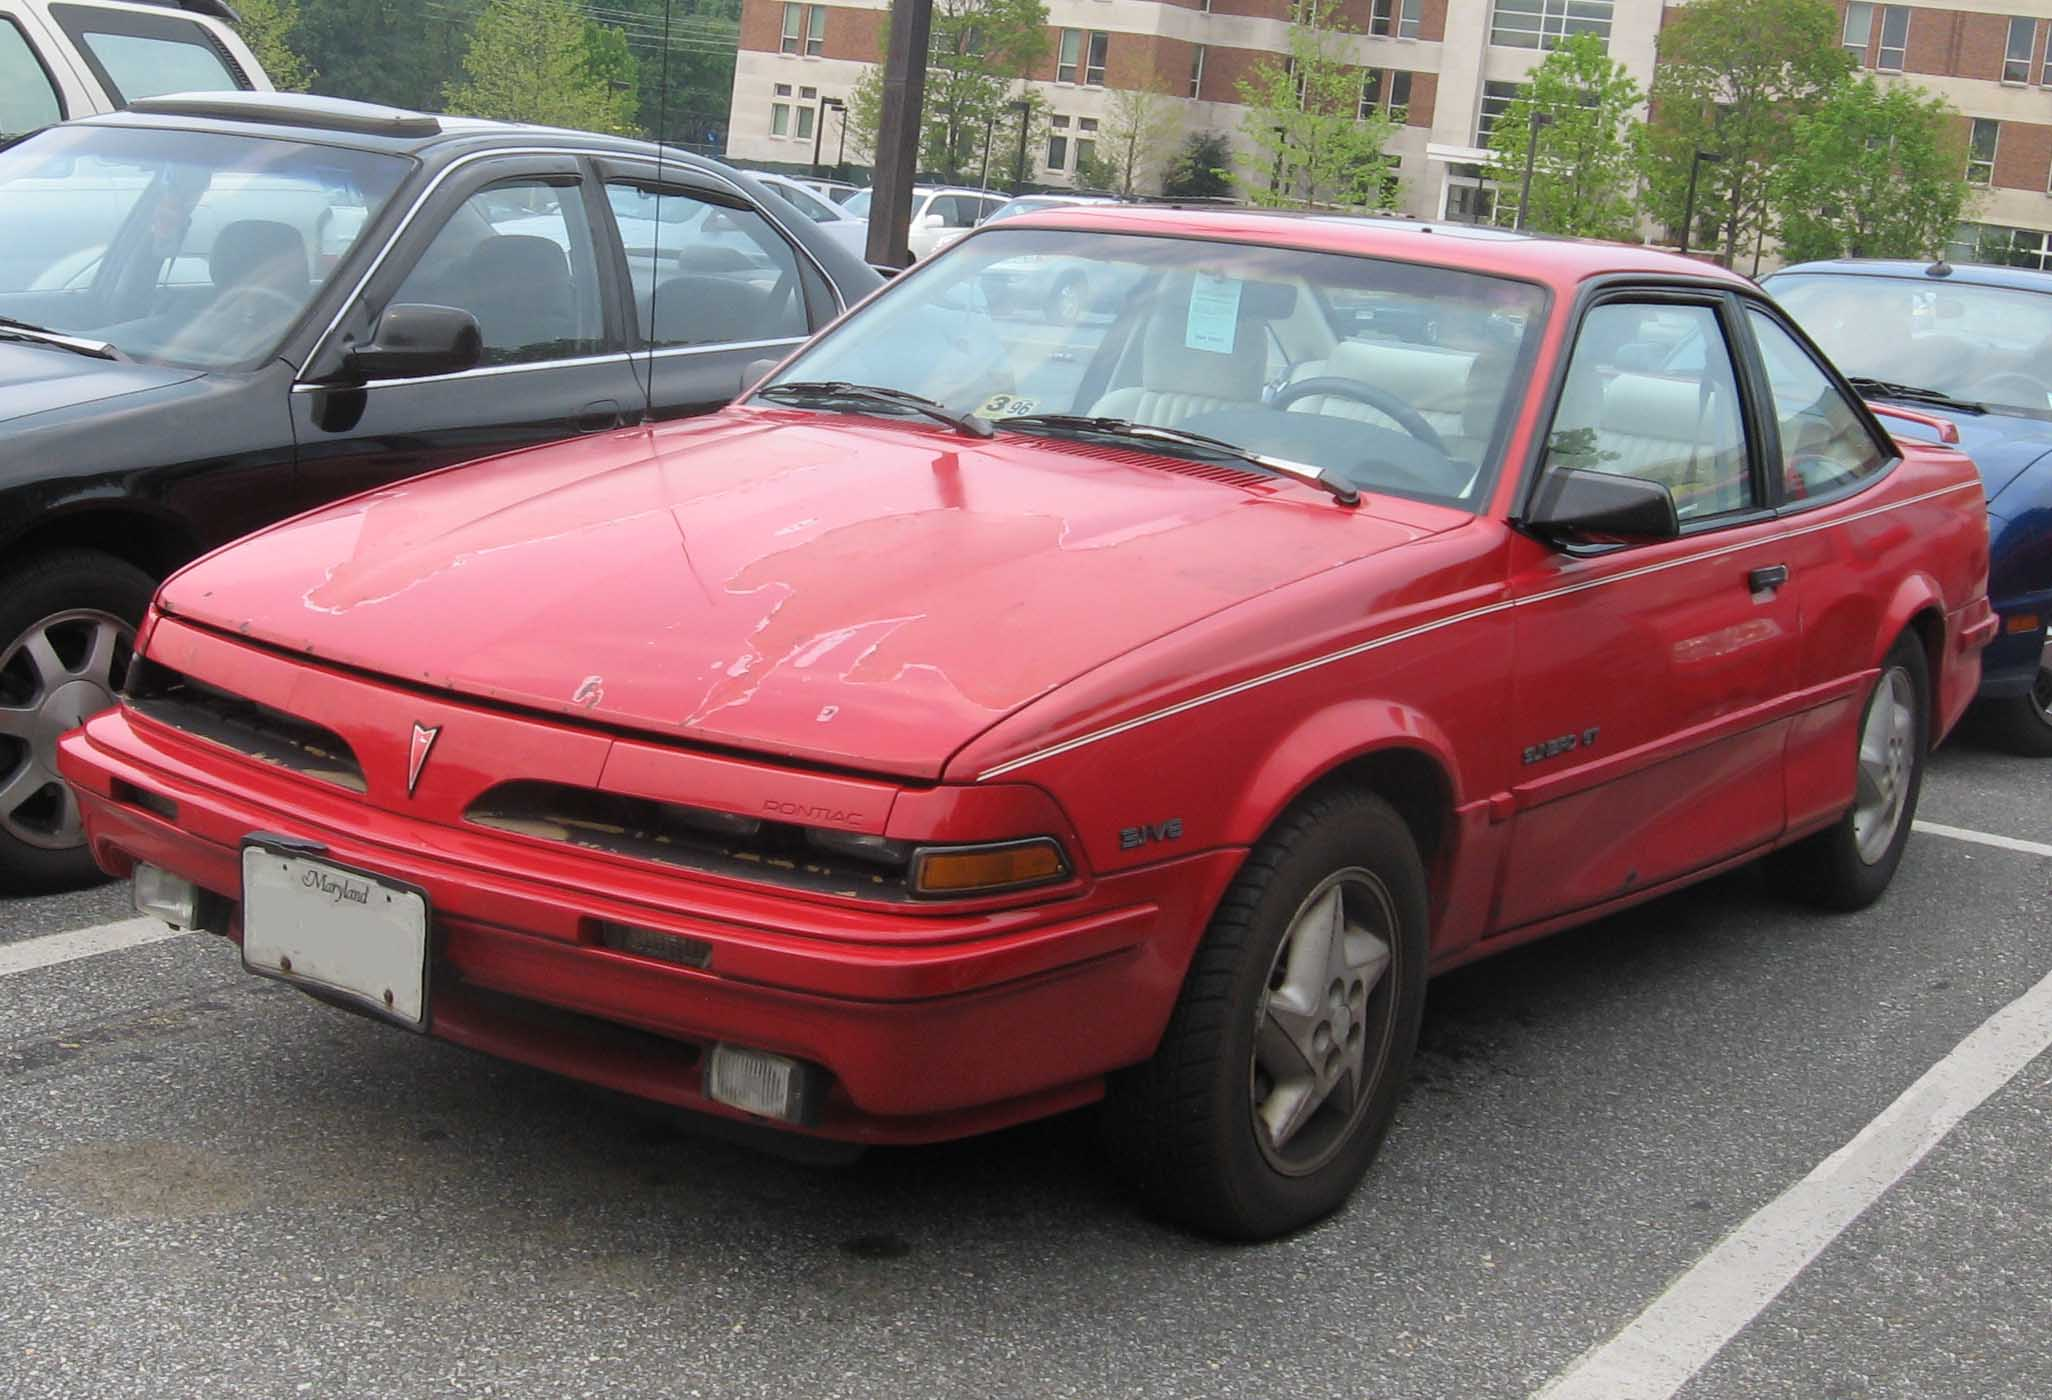 Pontiac Sunbird 1990 Photo - 1